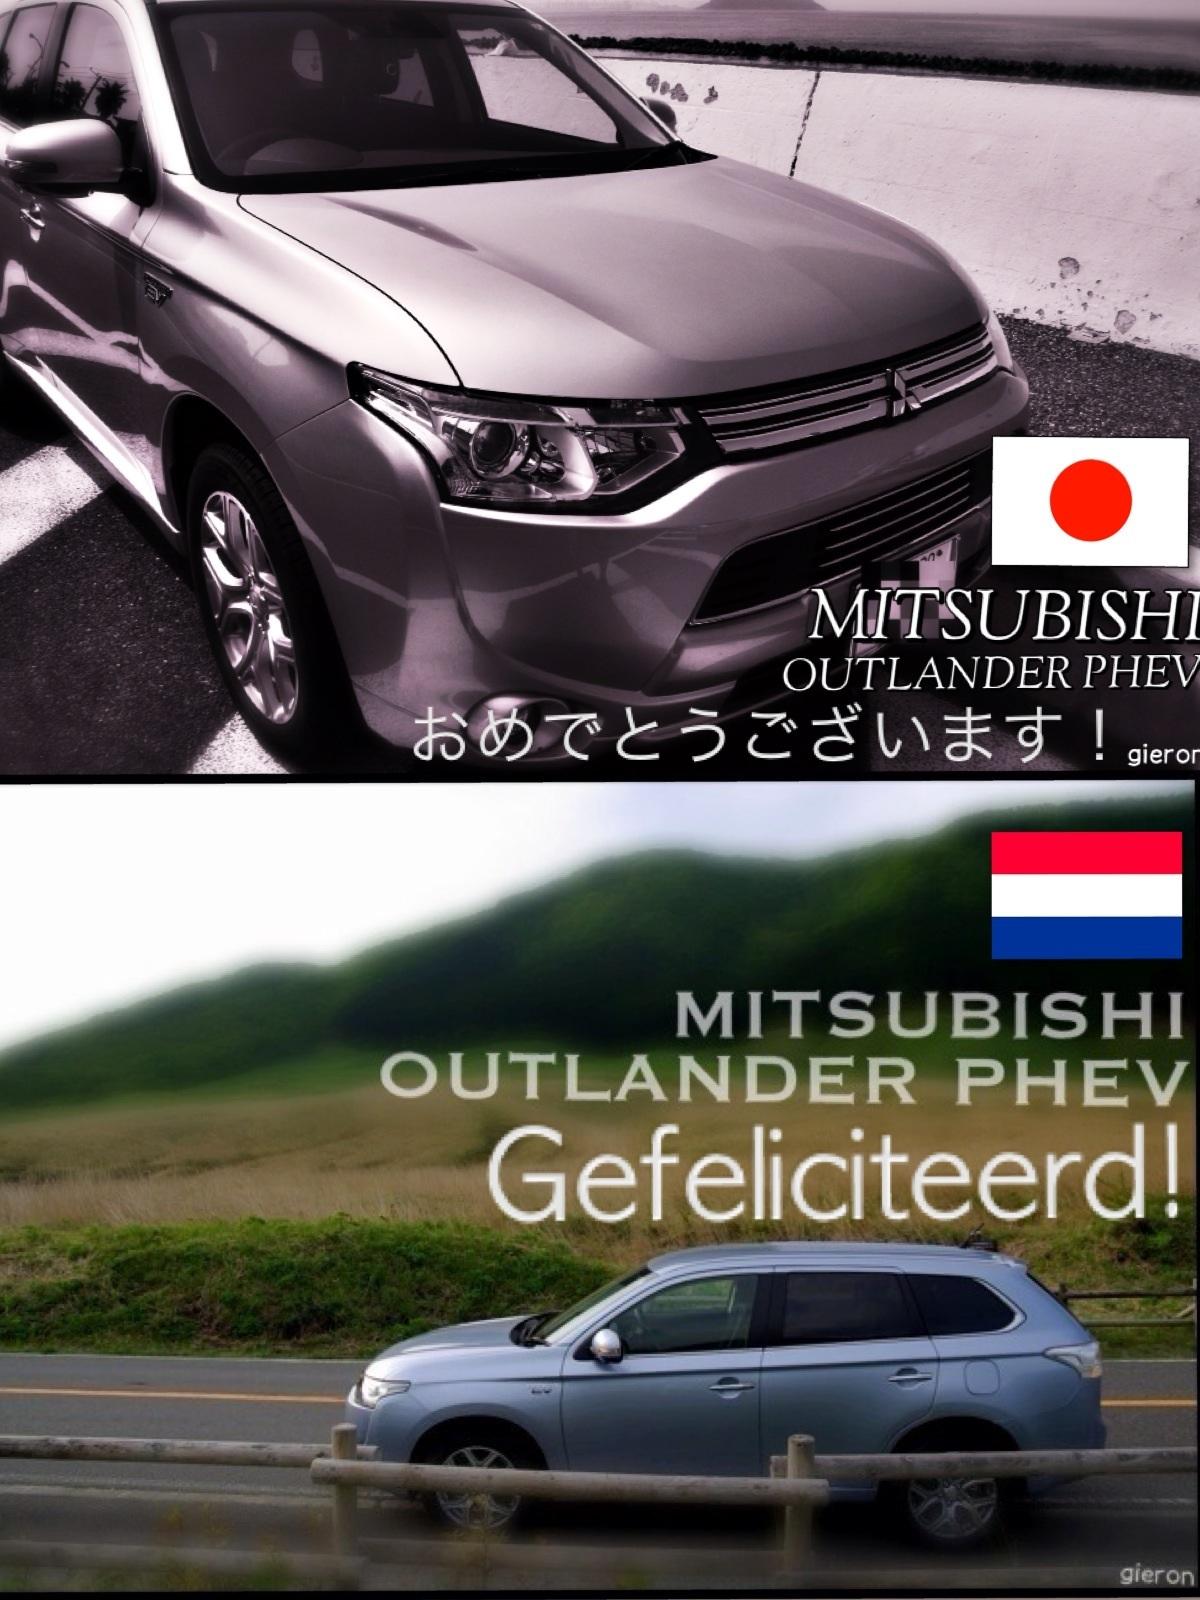 Mitsubishi outlander PHEV Japan To Netherland